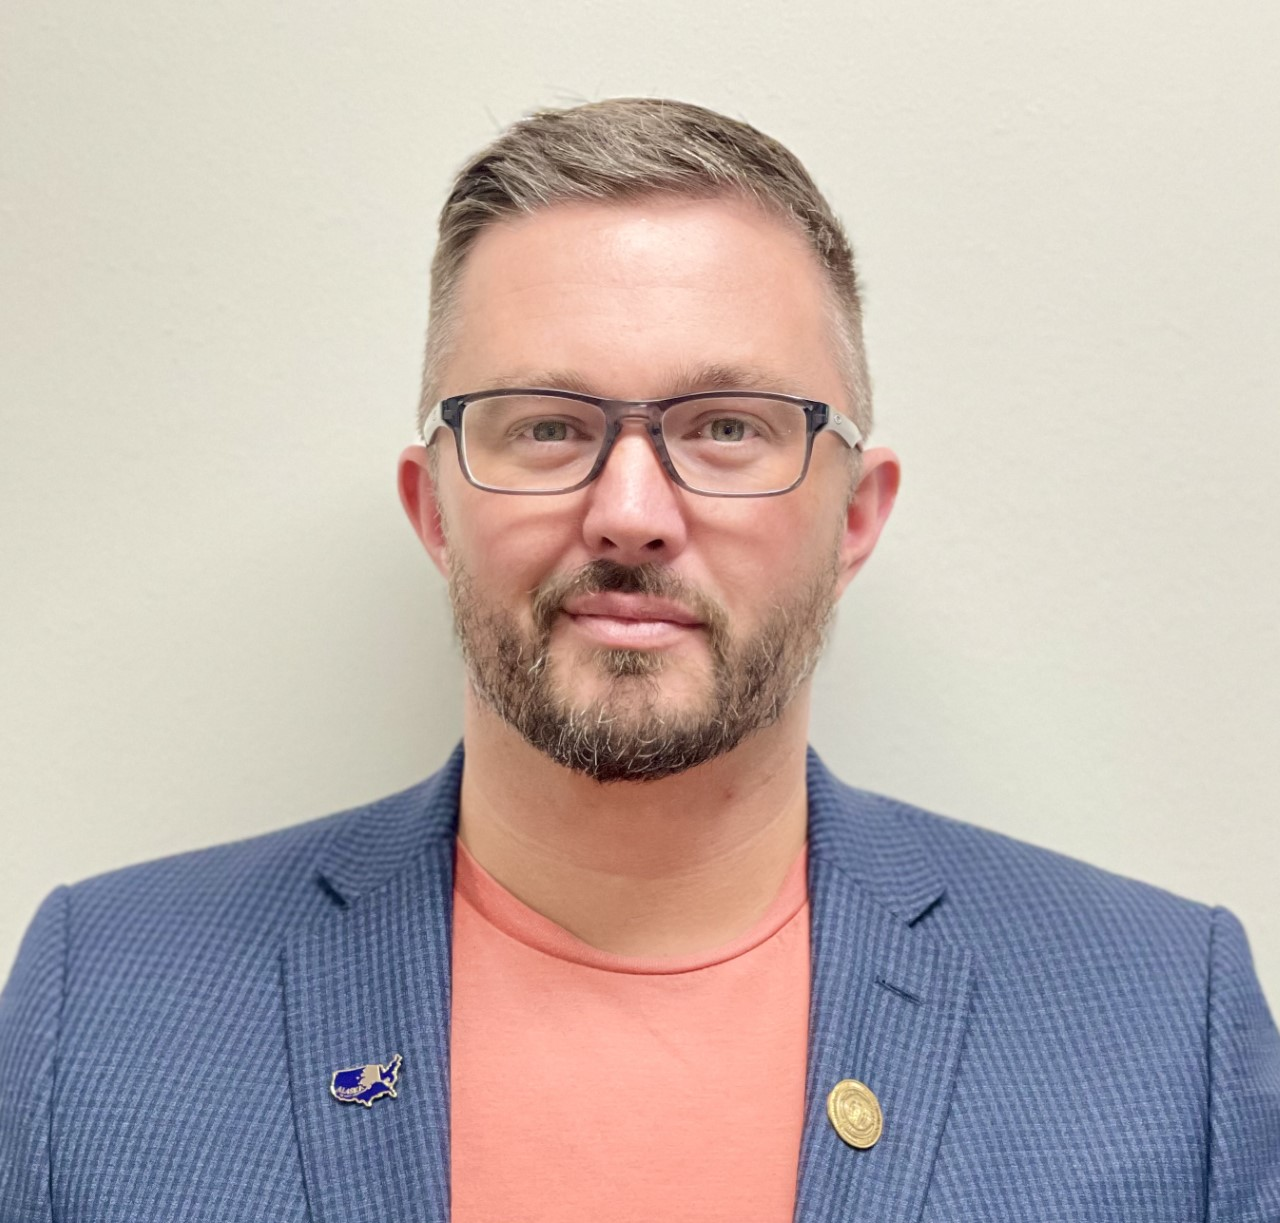 Jacob Howdeshell - Provided Headshot 2021